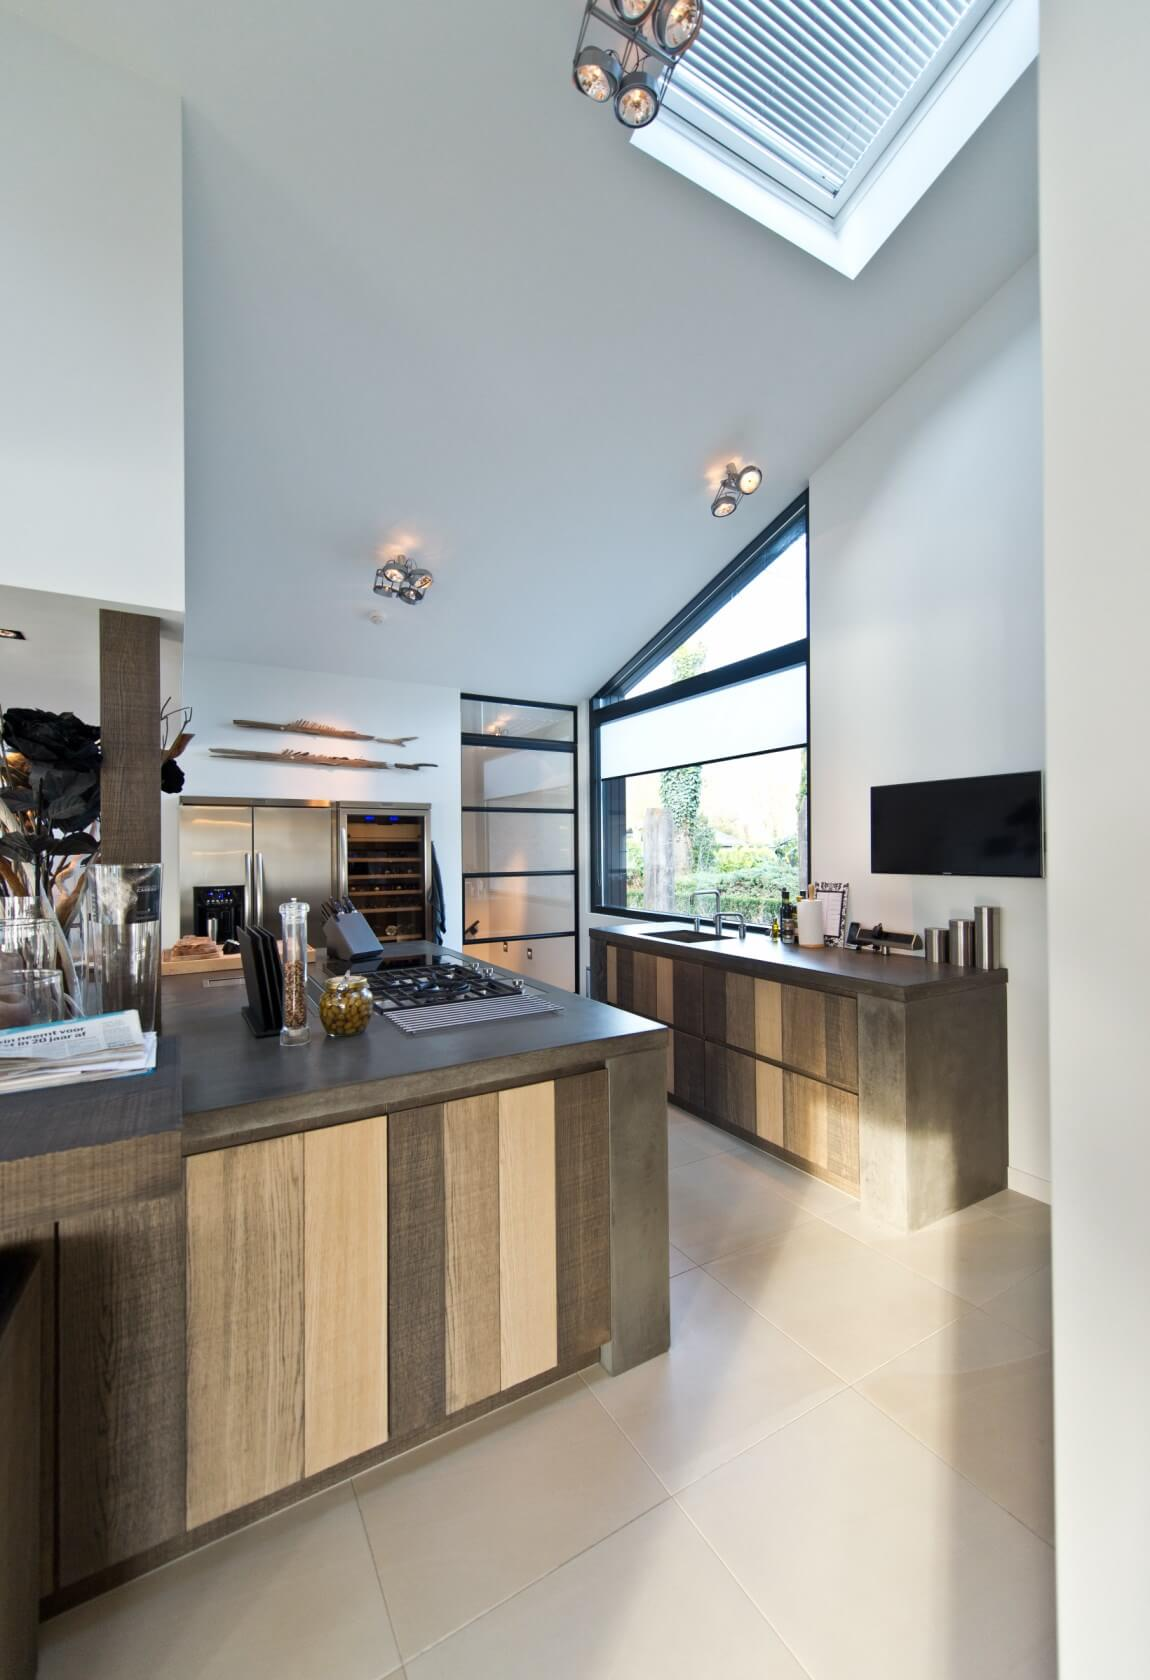 Handgemaakte (eiken)houten Tieleman-keuken